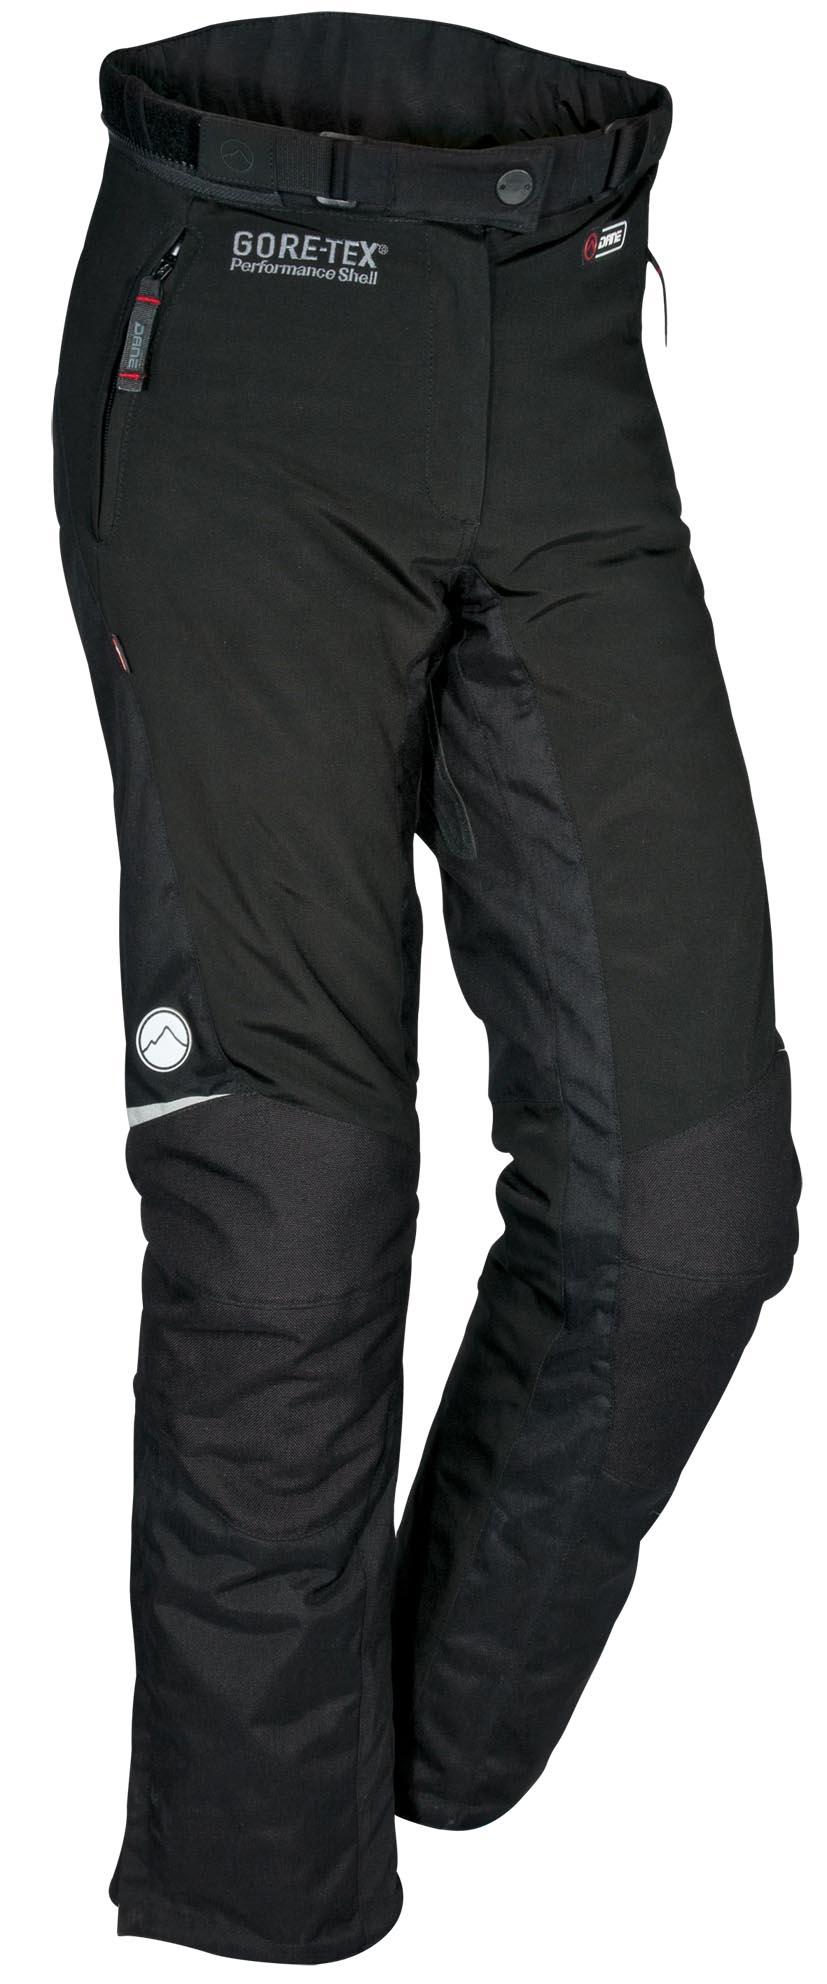 Pantalon Femme MERLE Gore-tex - Dane Noir motobigstore